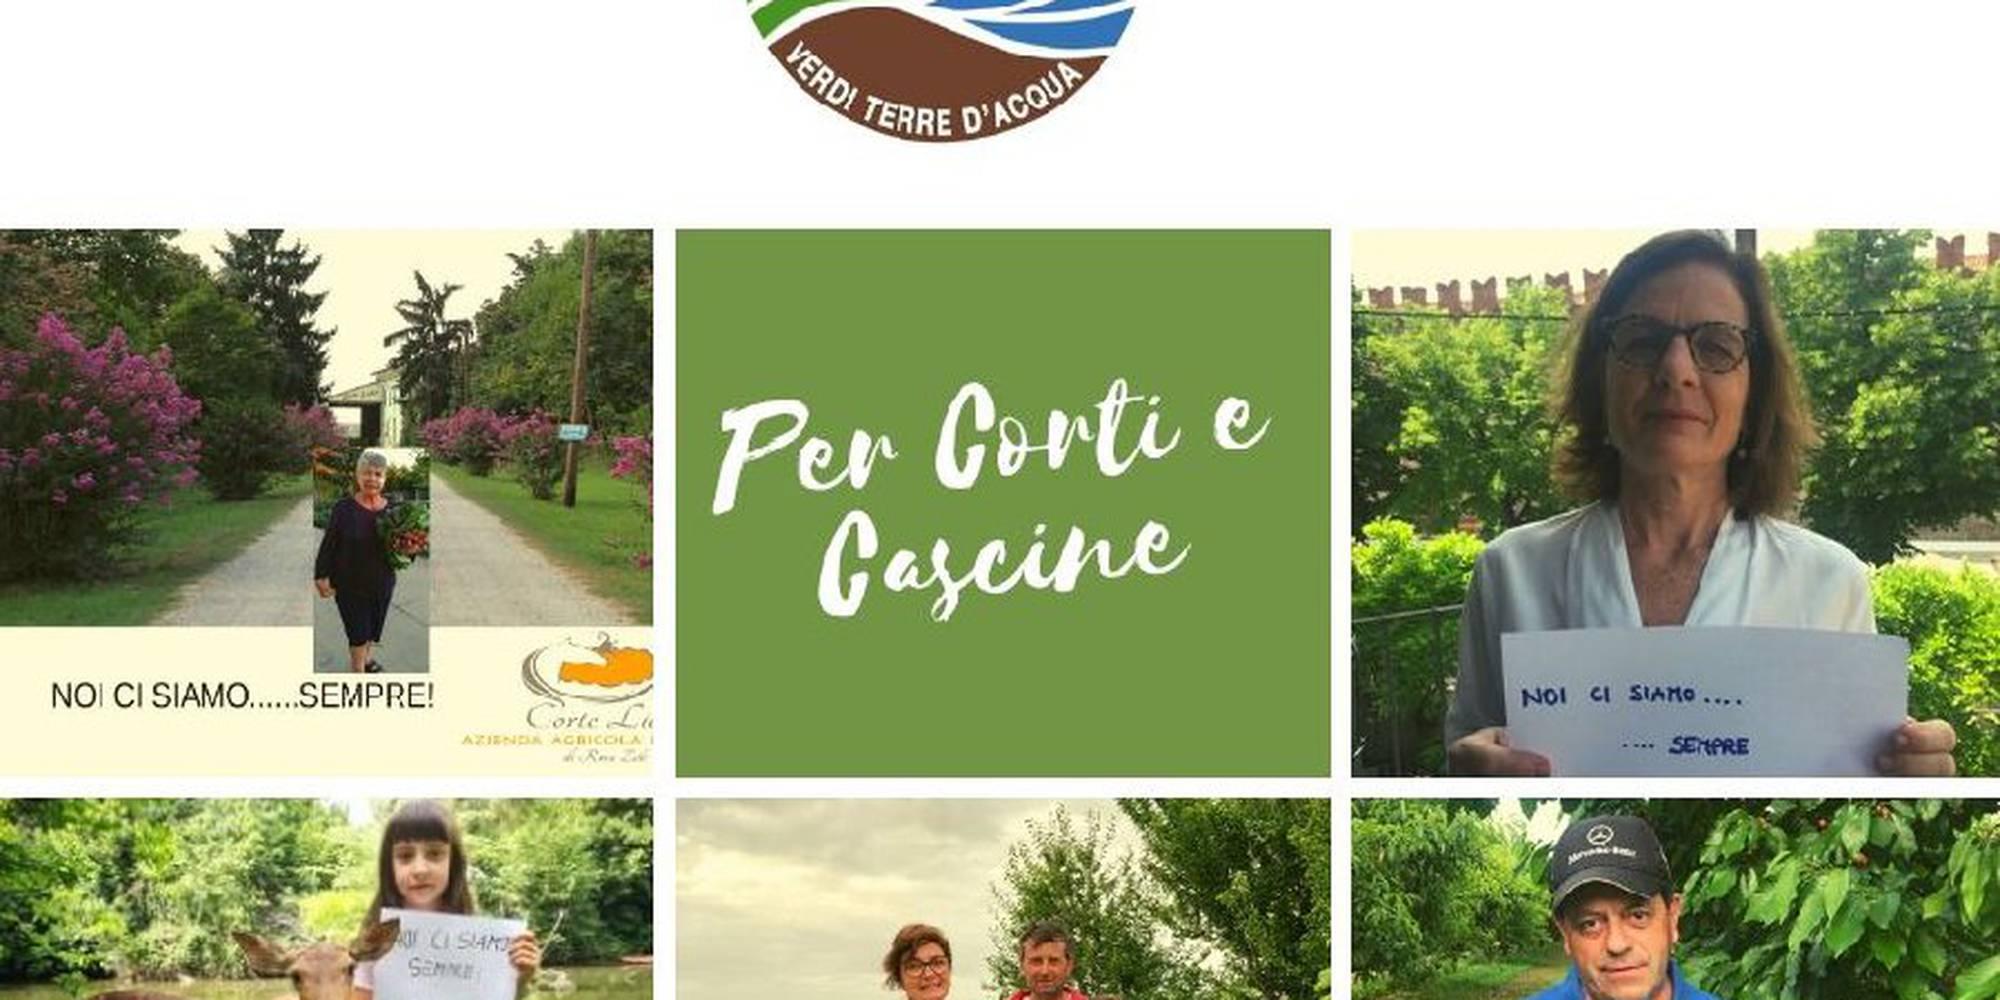 pert_corti_e_cascine_virtuale.jpg